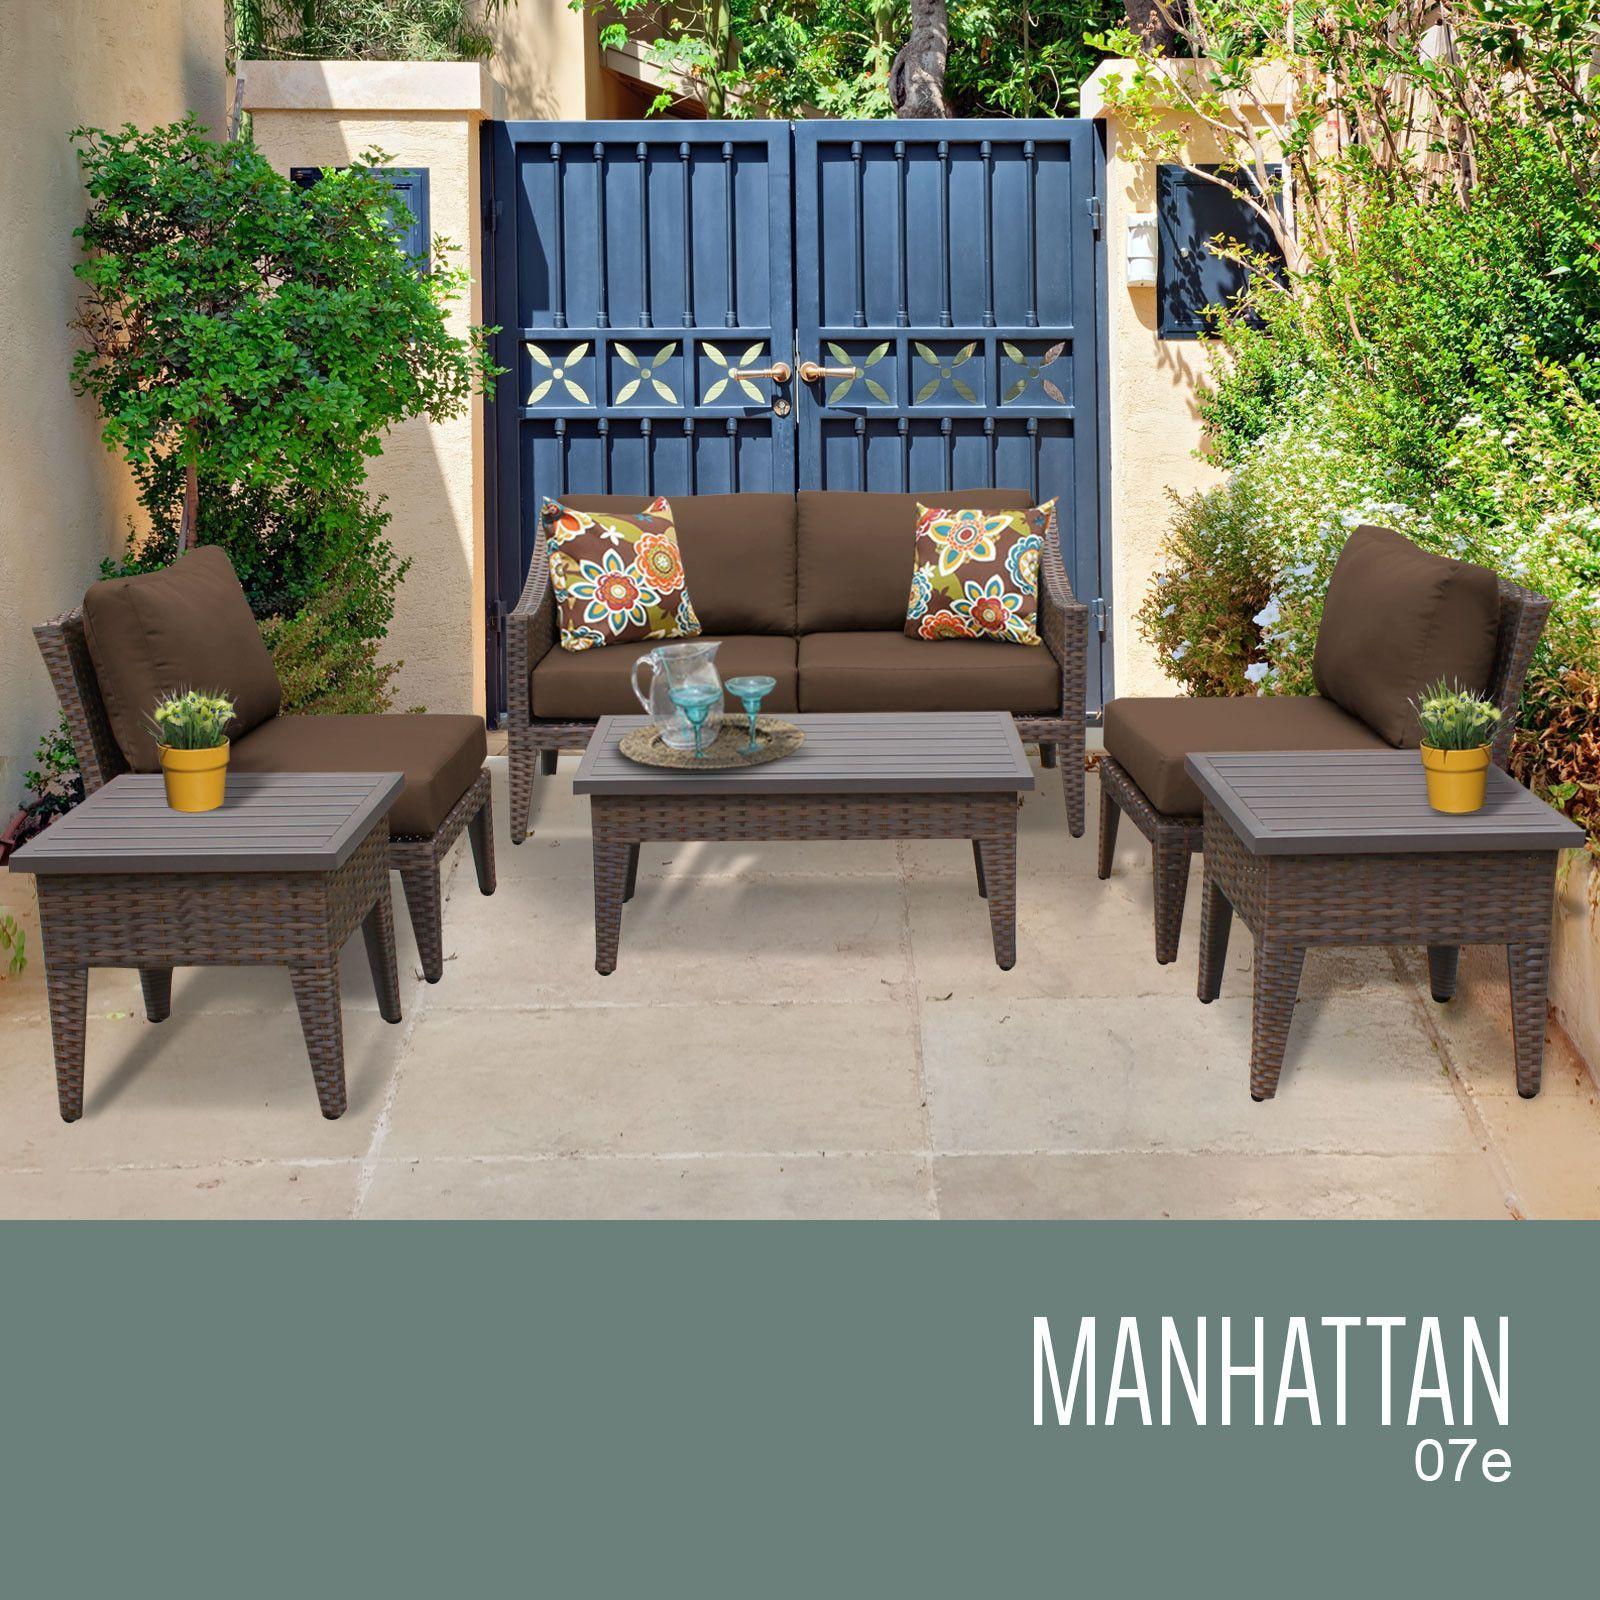 Charming Manhattan 7 Piece Outdoor Wicker Patio Furniture Set 07e